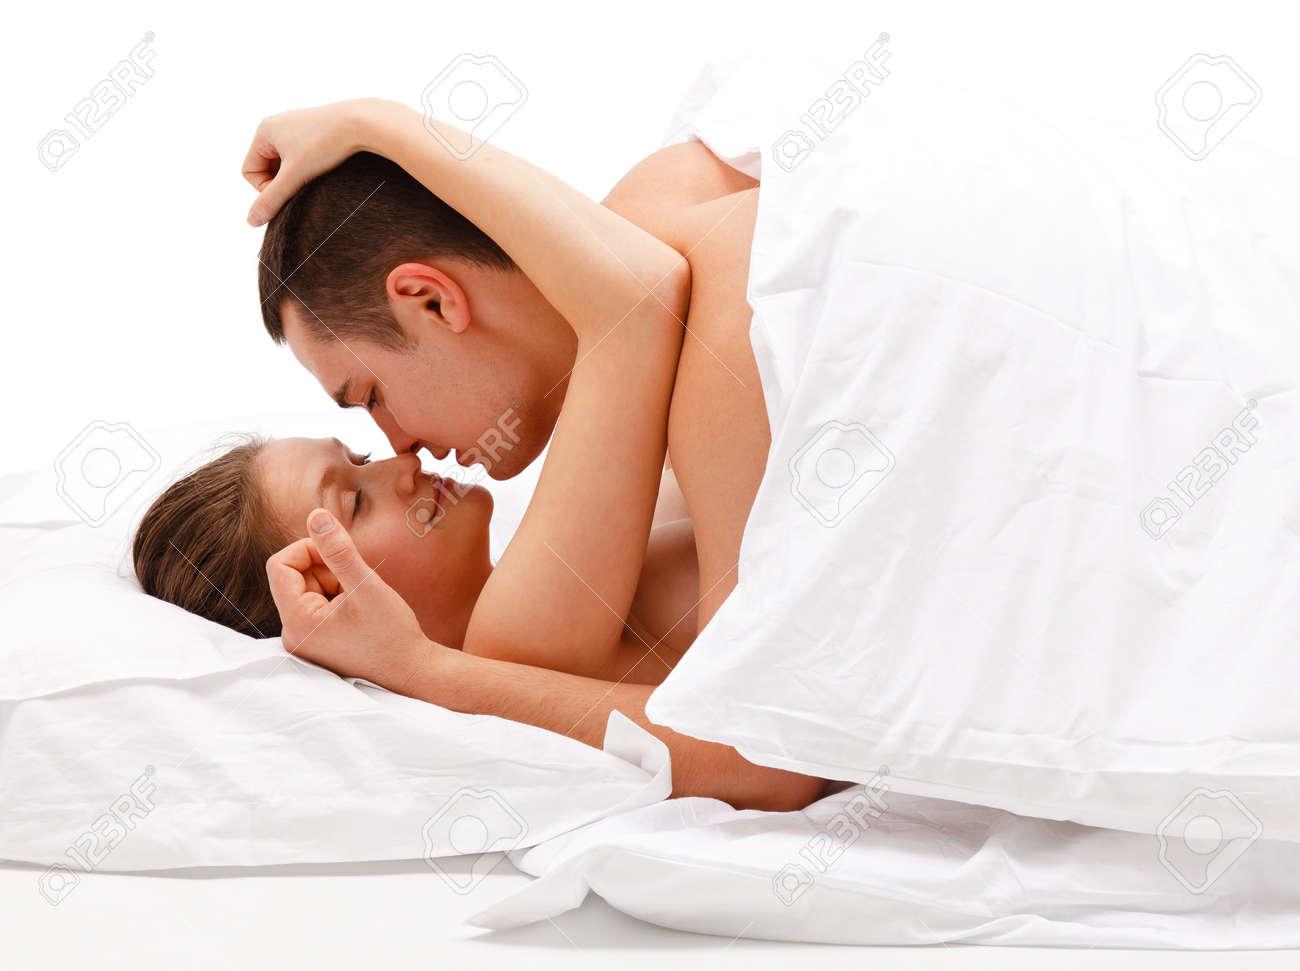 Tattoo homo oral stimulation with ejaculation